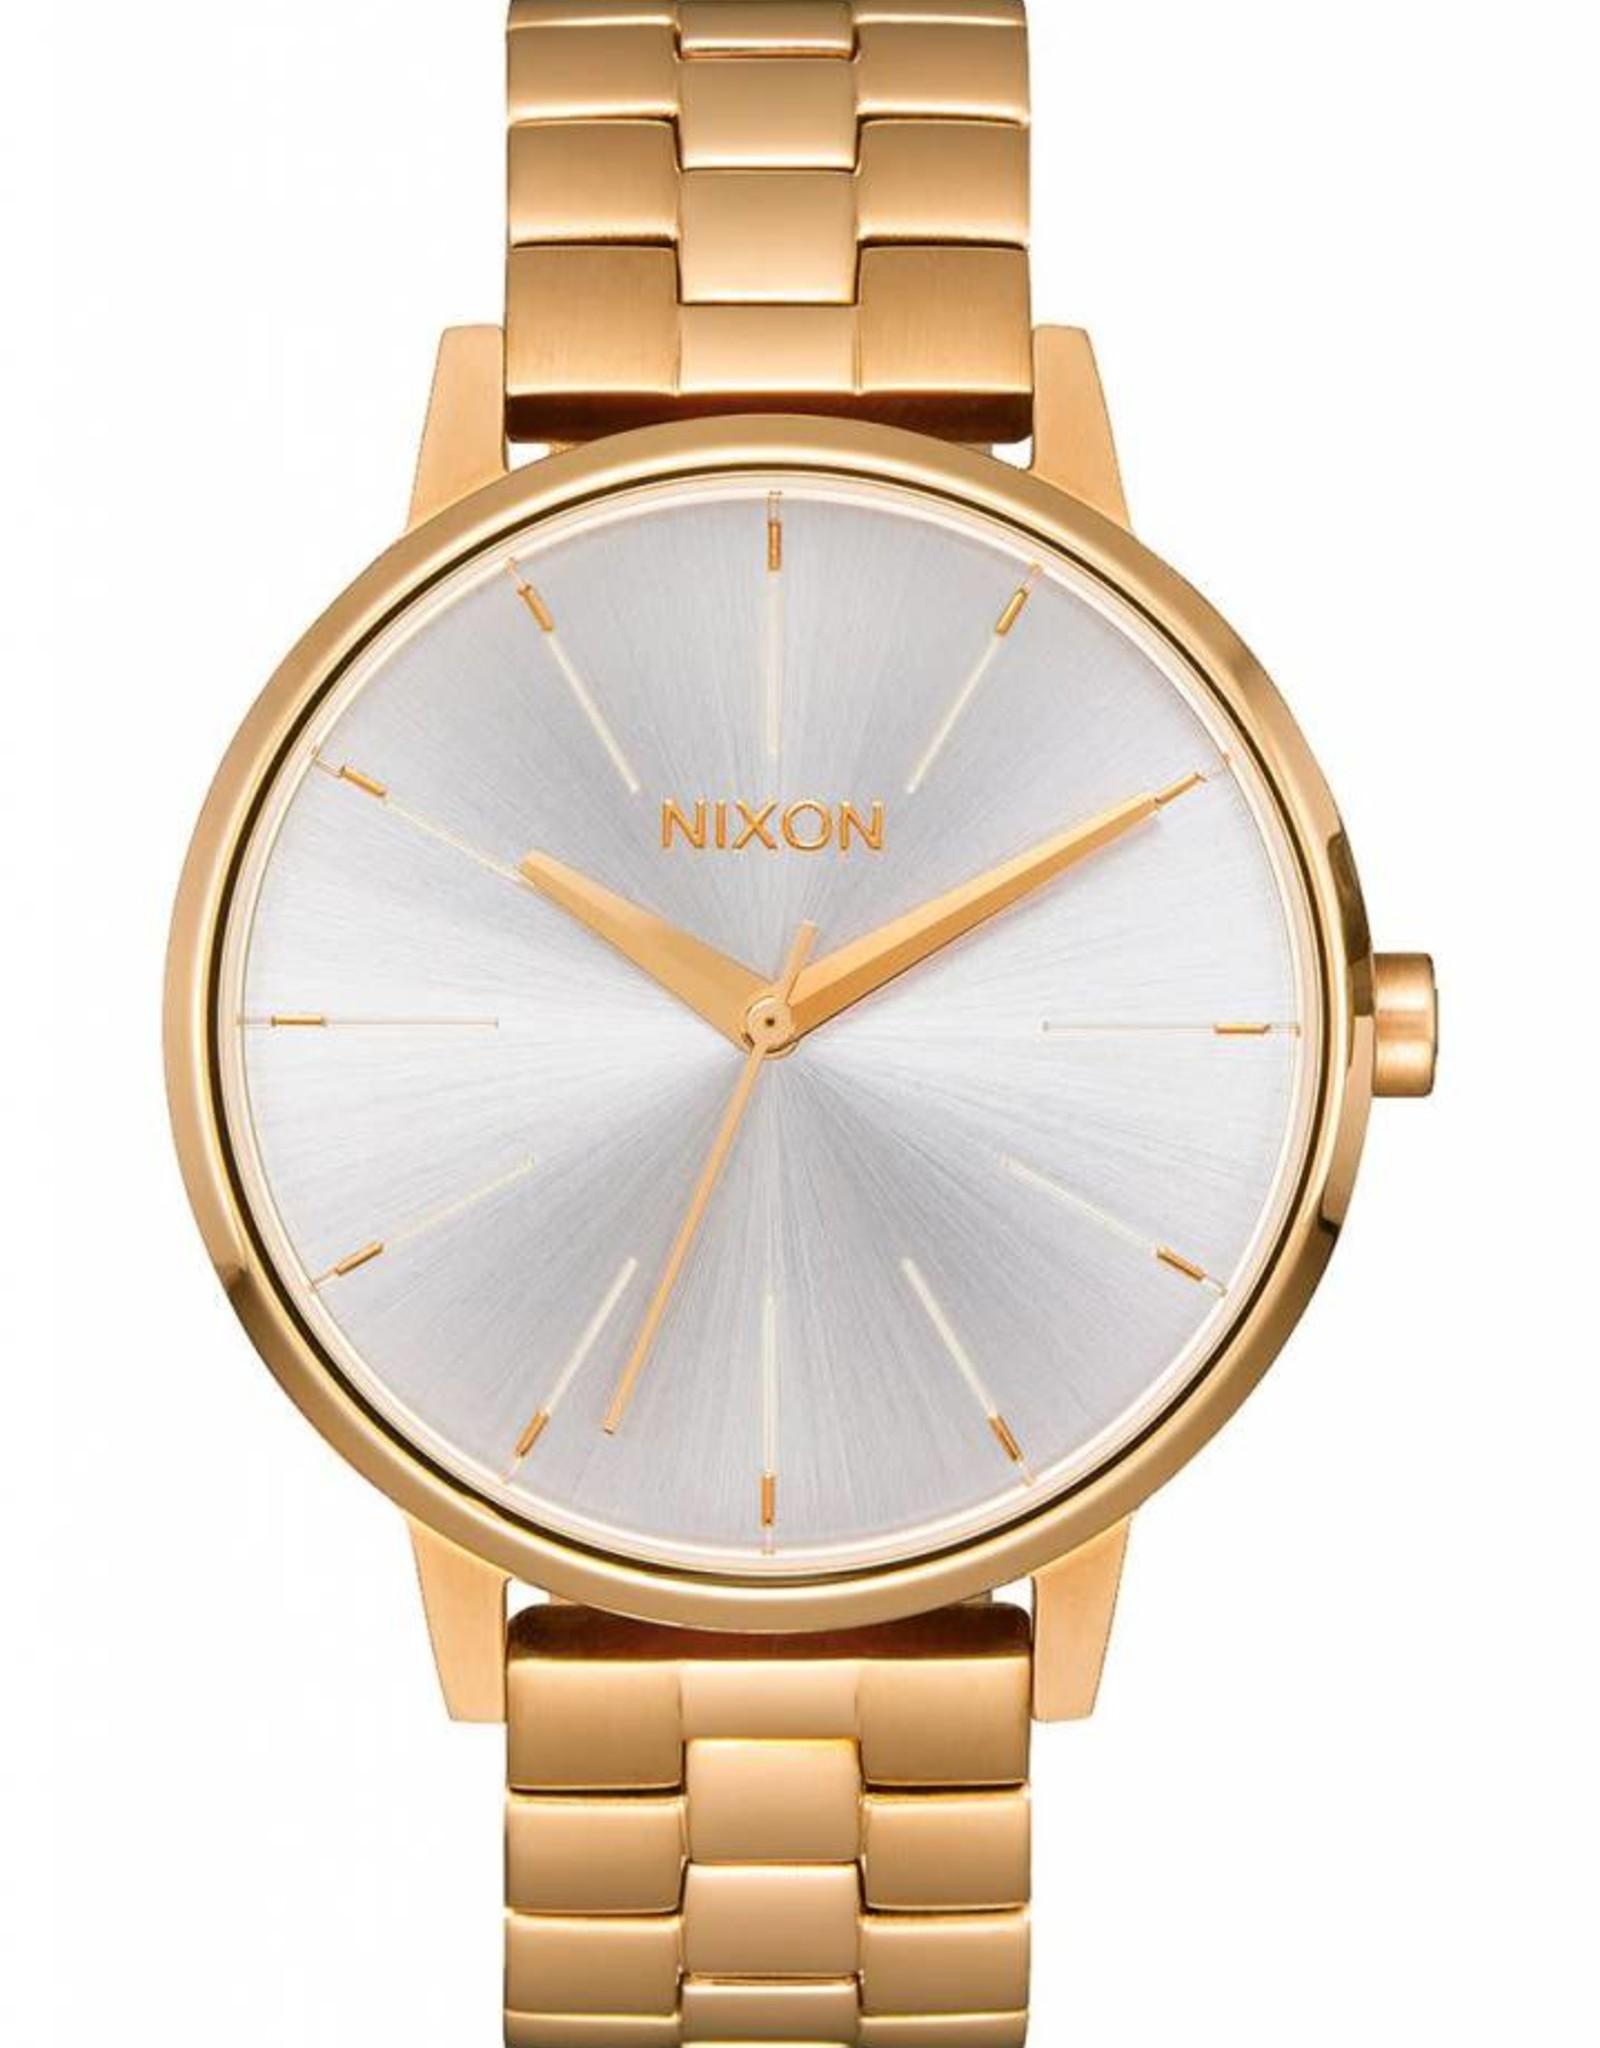 NIXON Kensington watch, gold